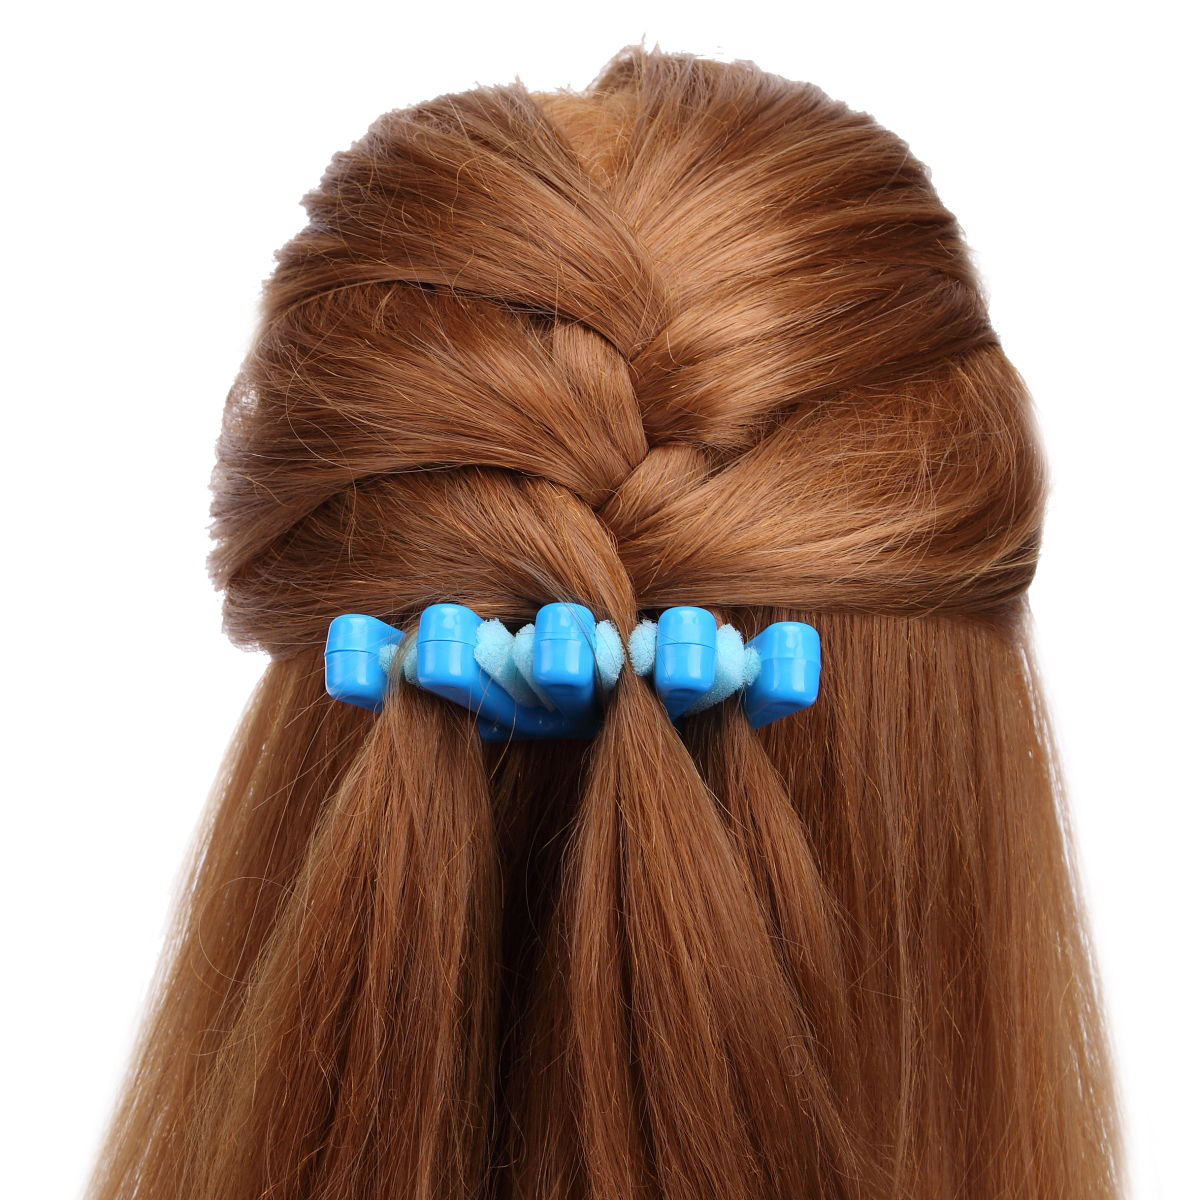 2 Colors Lady French Hair Braiding Tool Weave Braid Roller Hair